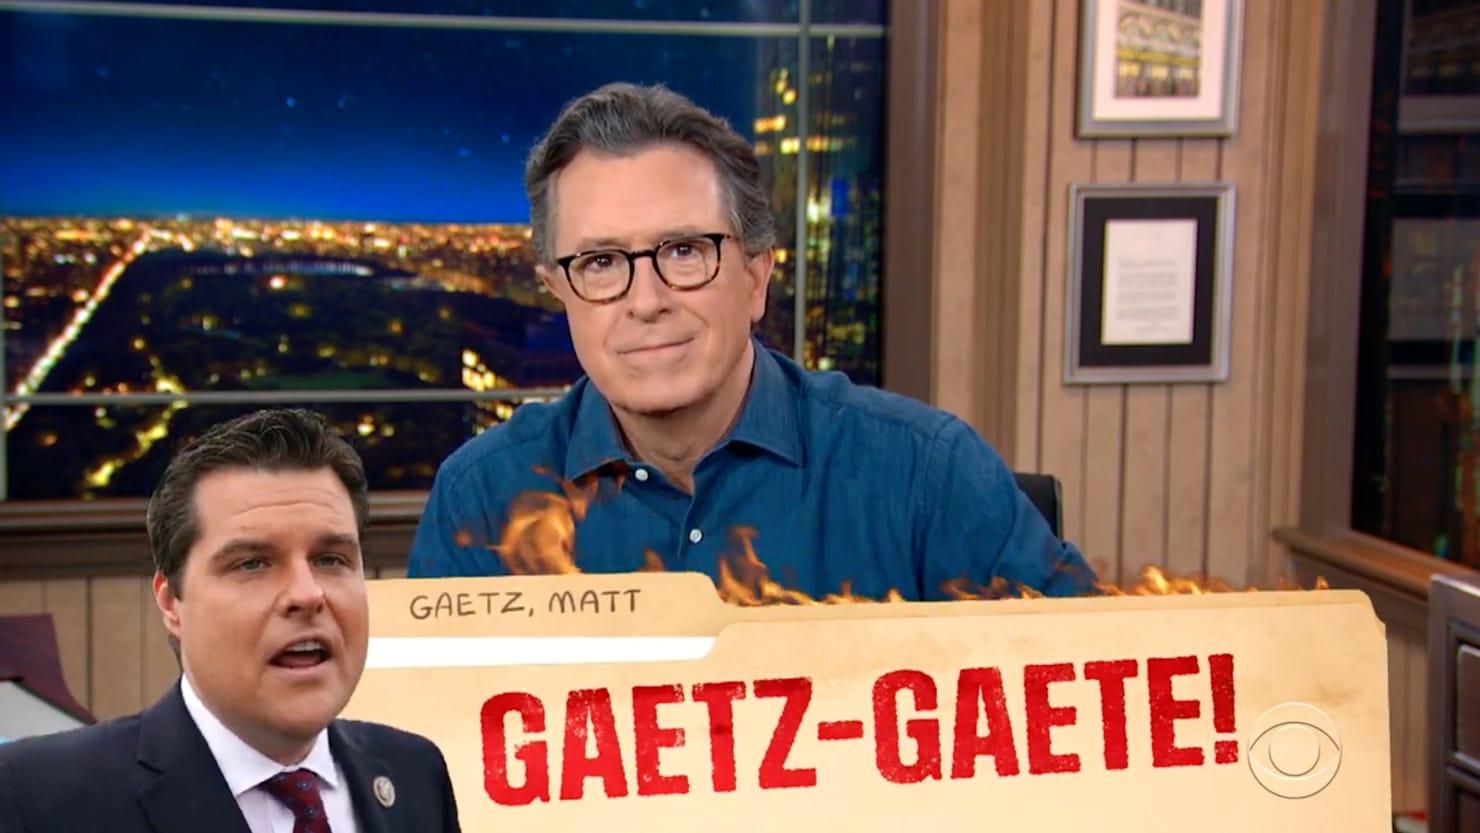 Stephen Colbert Absolutely Destroys Matt Gaetz's Trump Pardon Fail